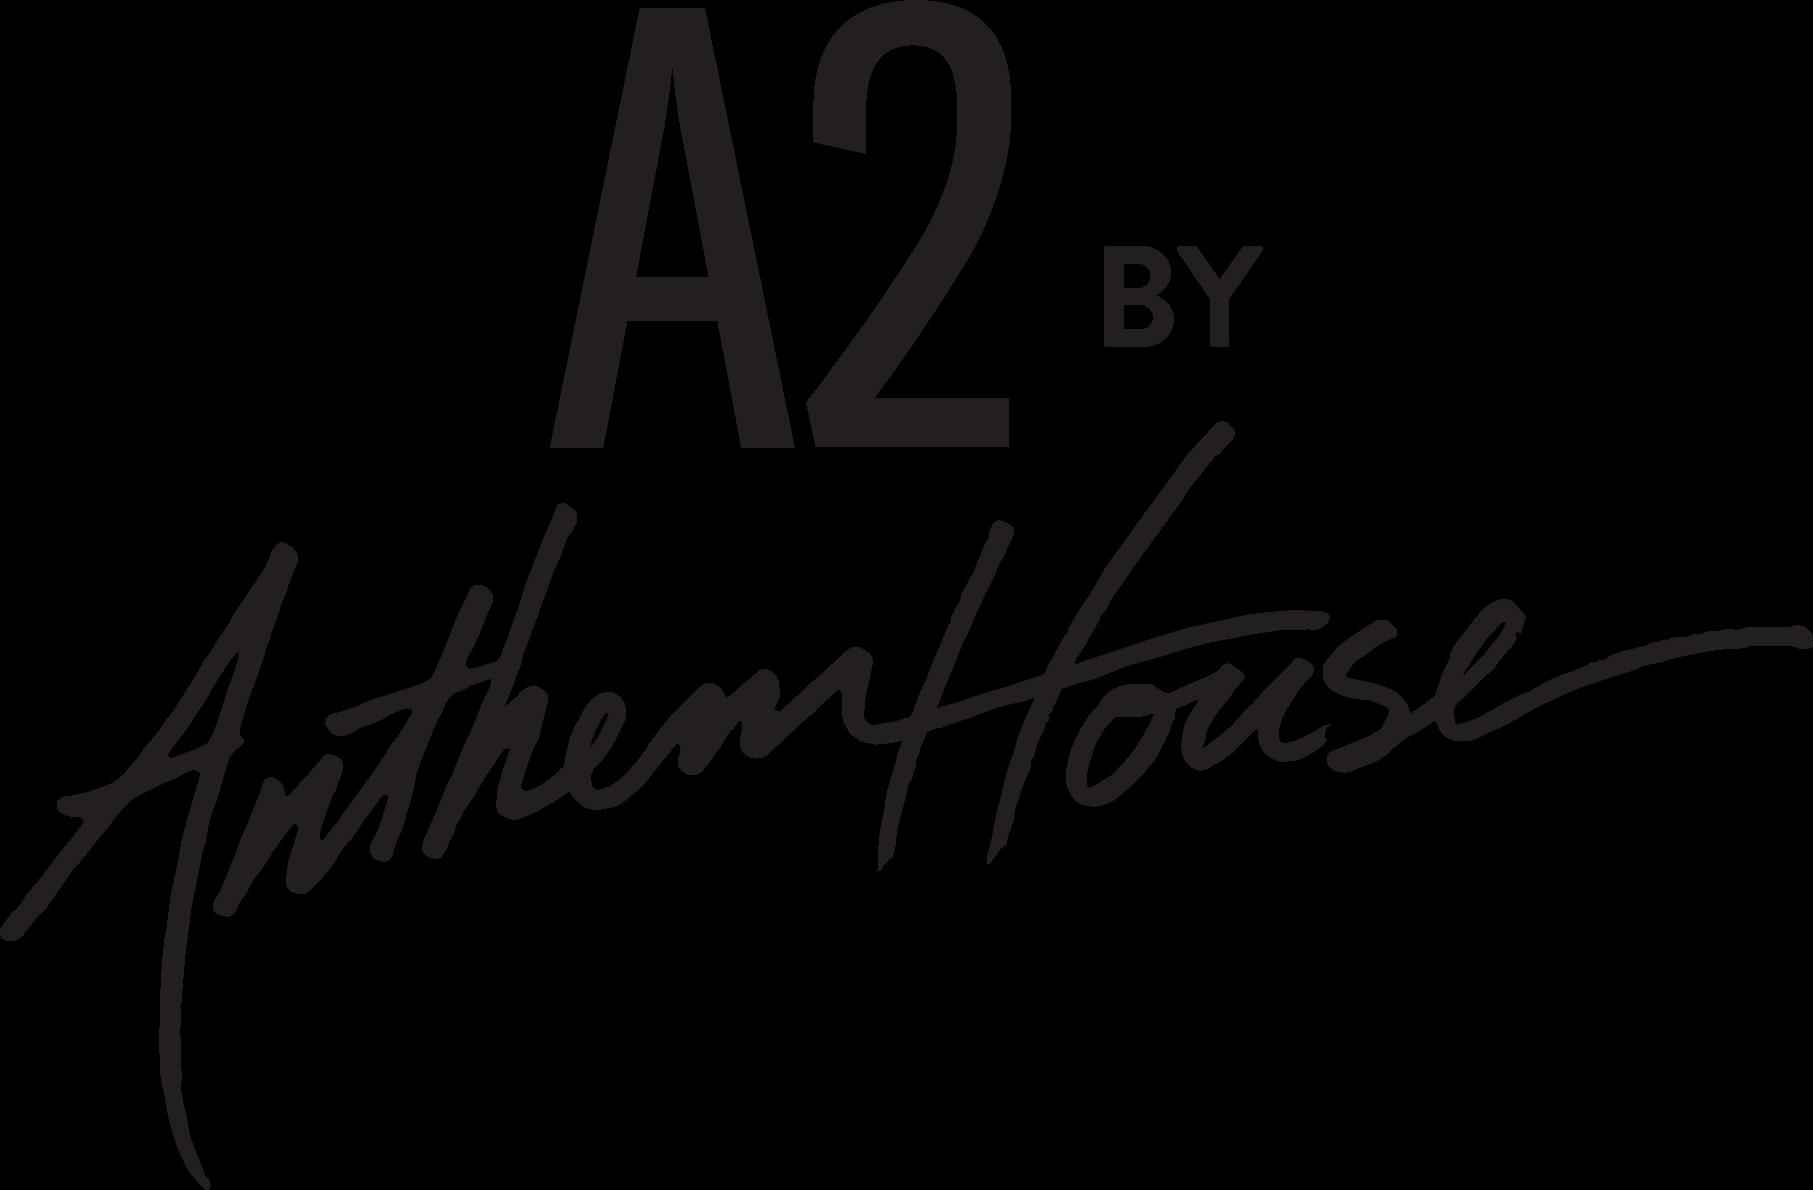 a2 by anthem house